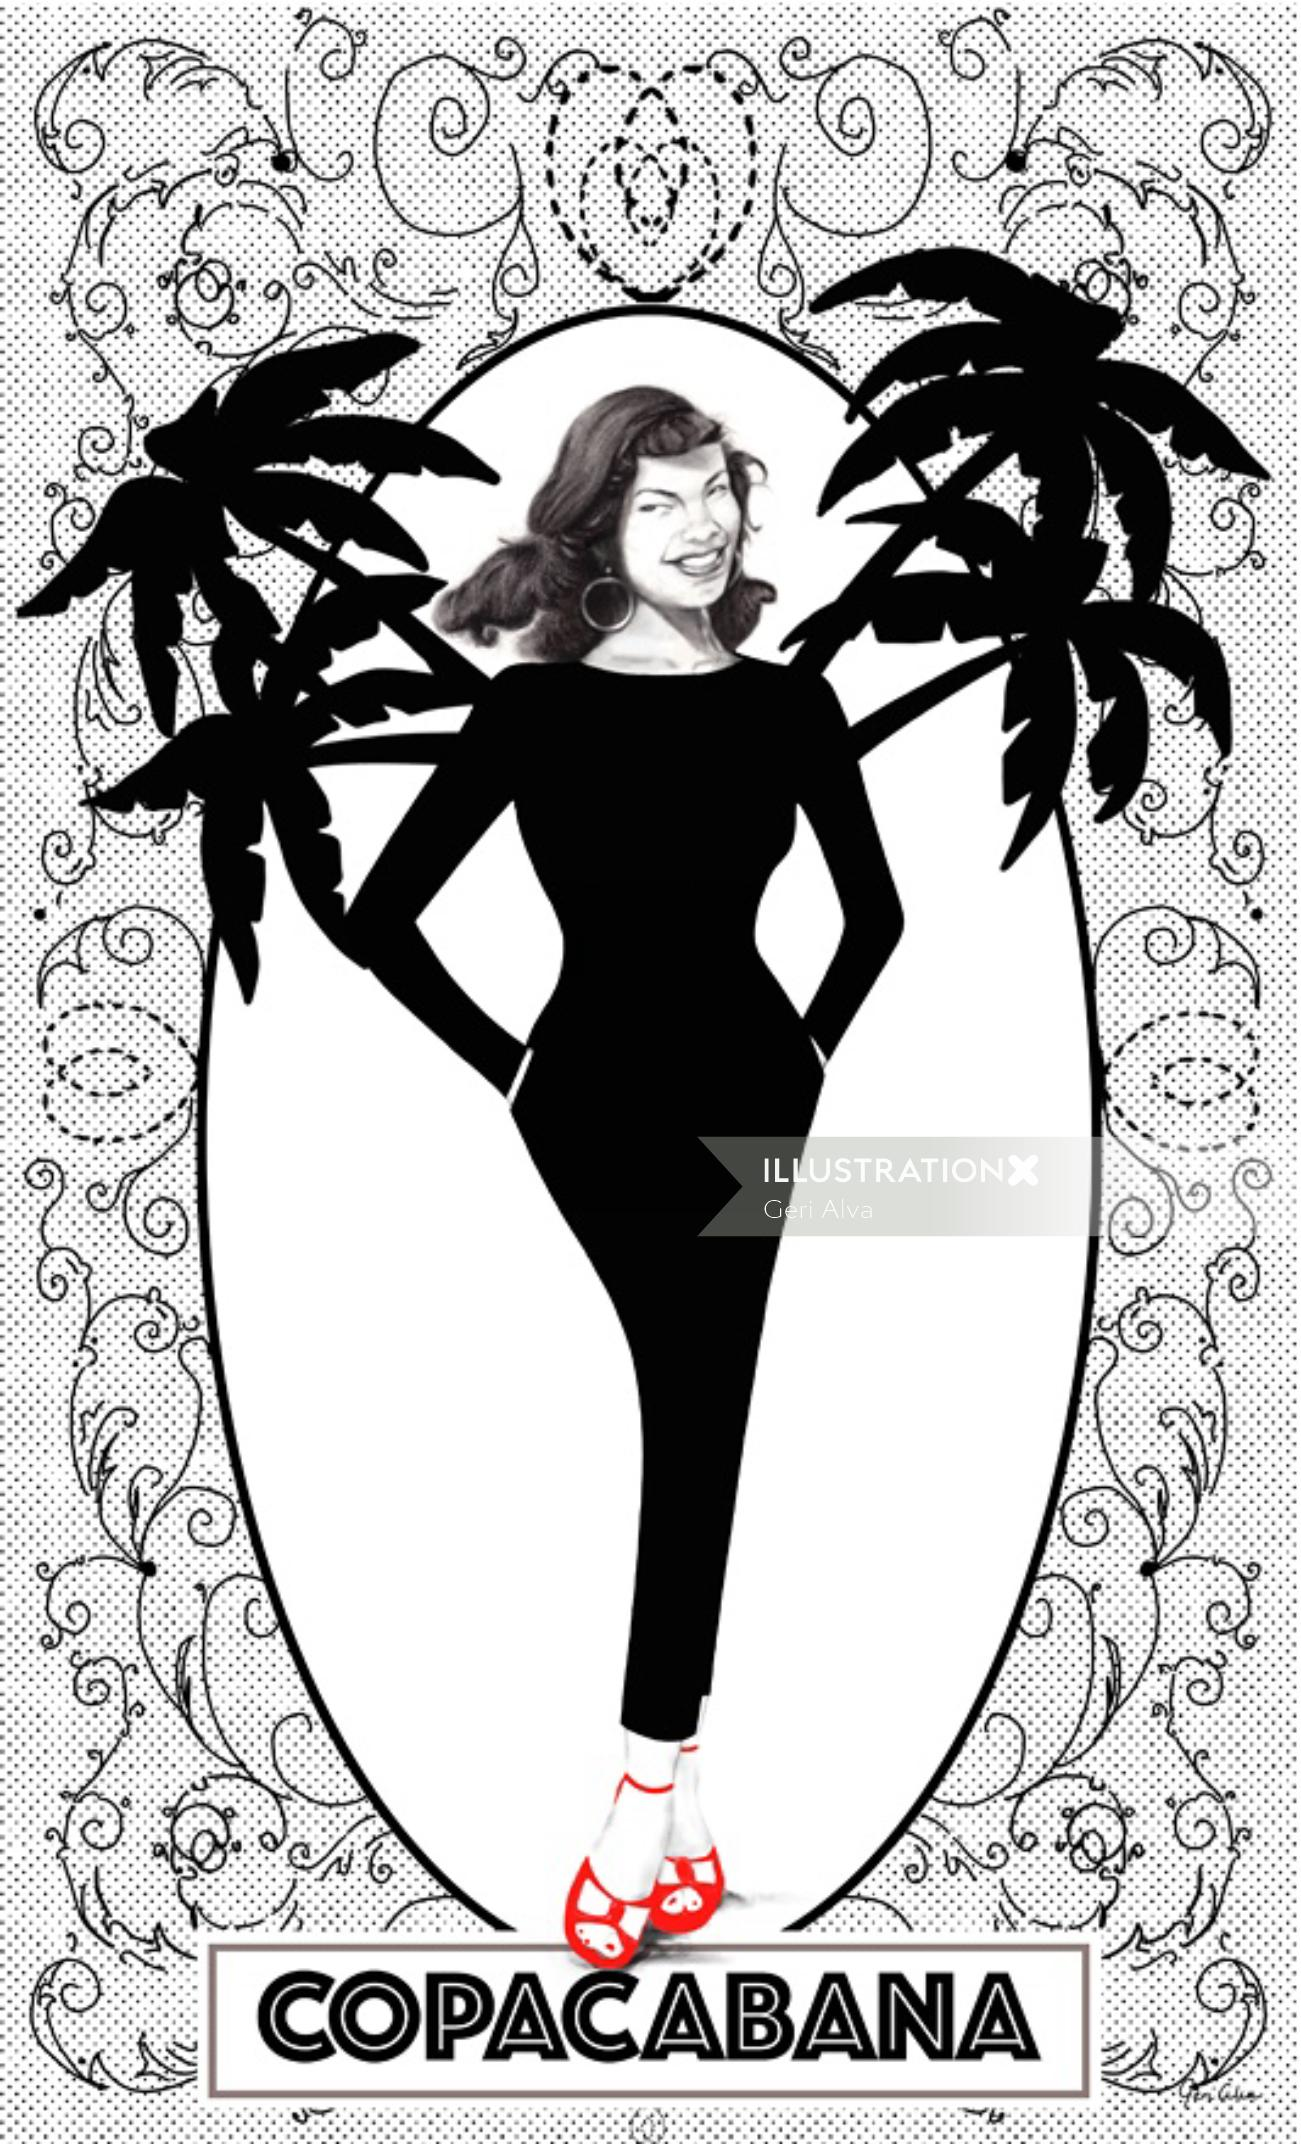 Copacabana, brazil Copacabana, brazil beach, vintage illustrations, palm tree illustrations, vintage